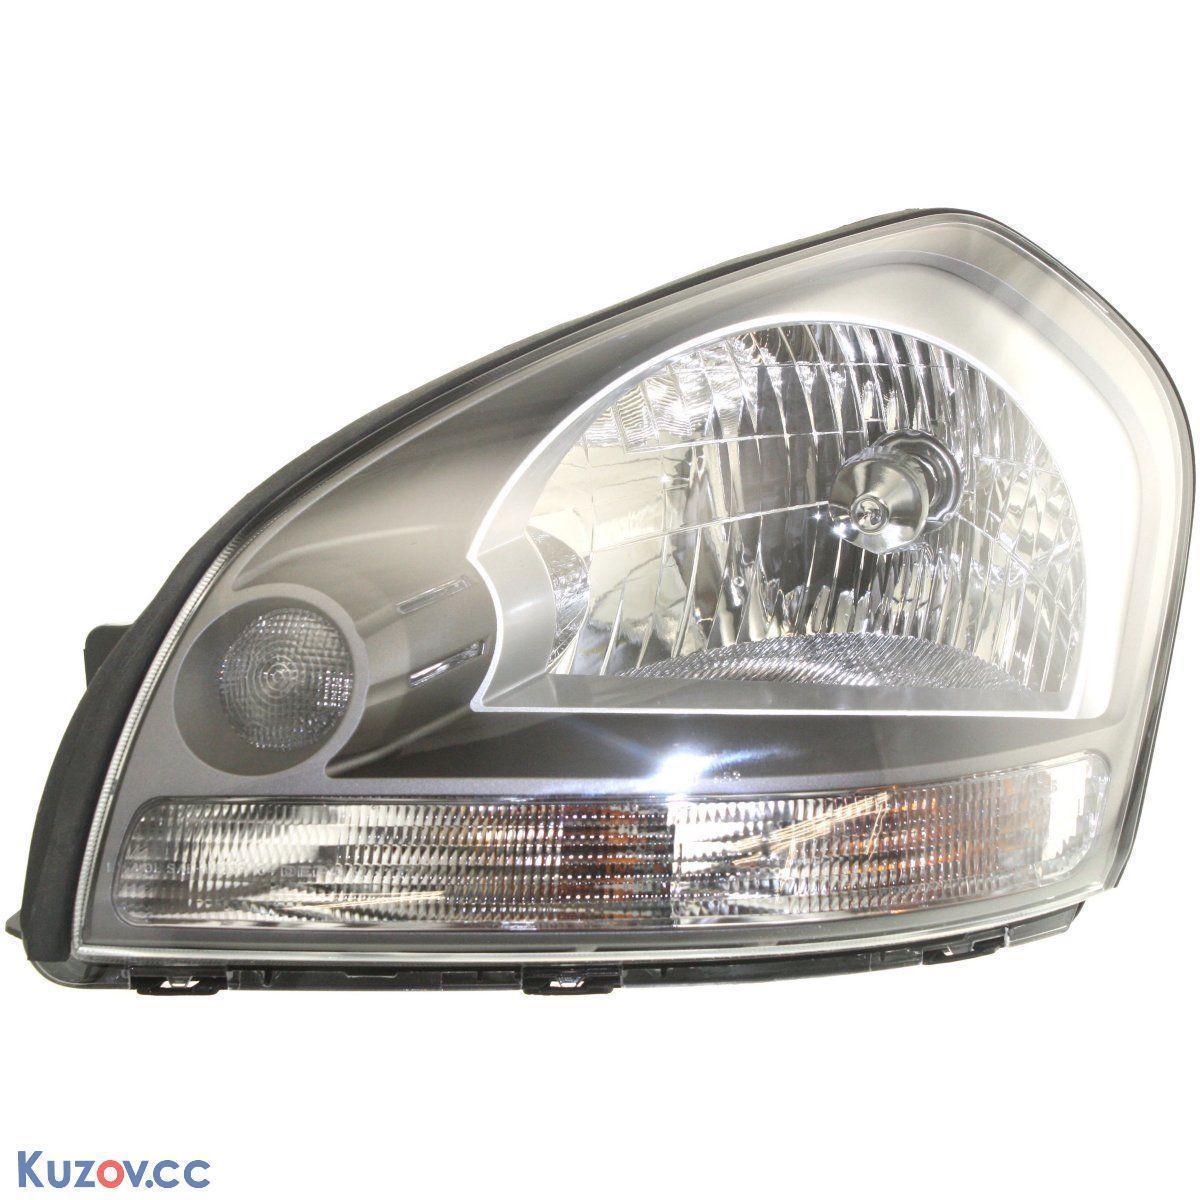 Фара Hyundai Tucson електрична ліва чорна (DEPO) 921032E010